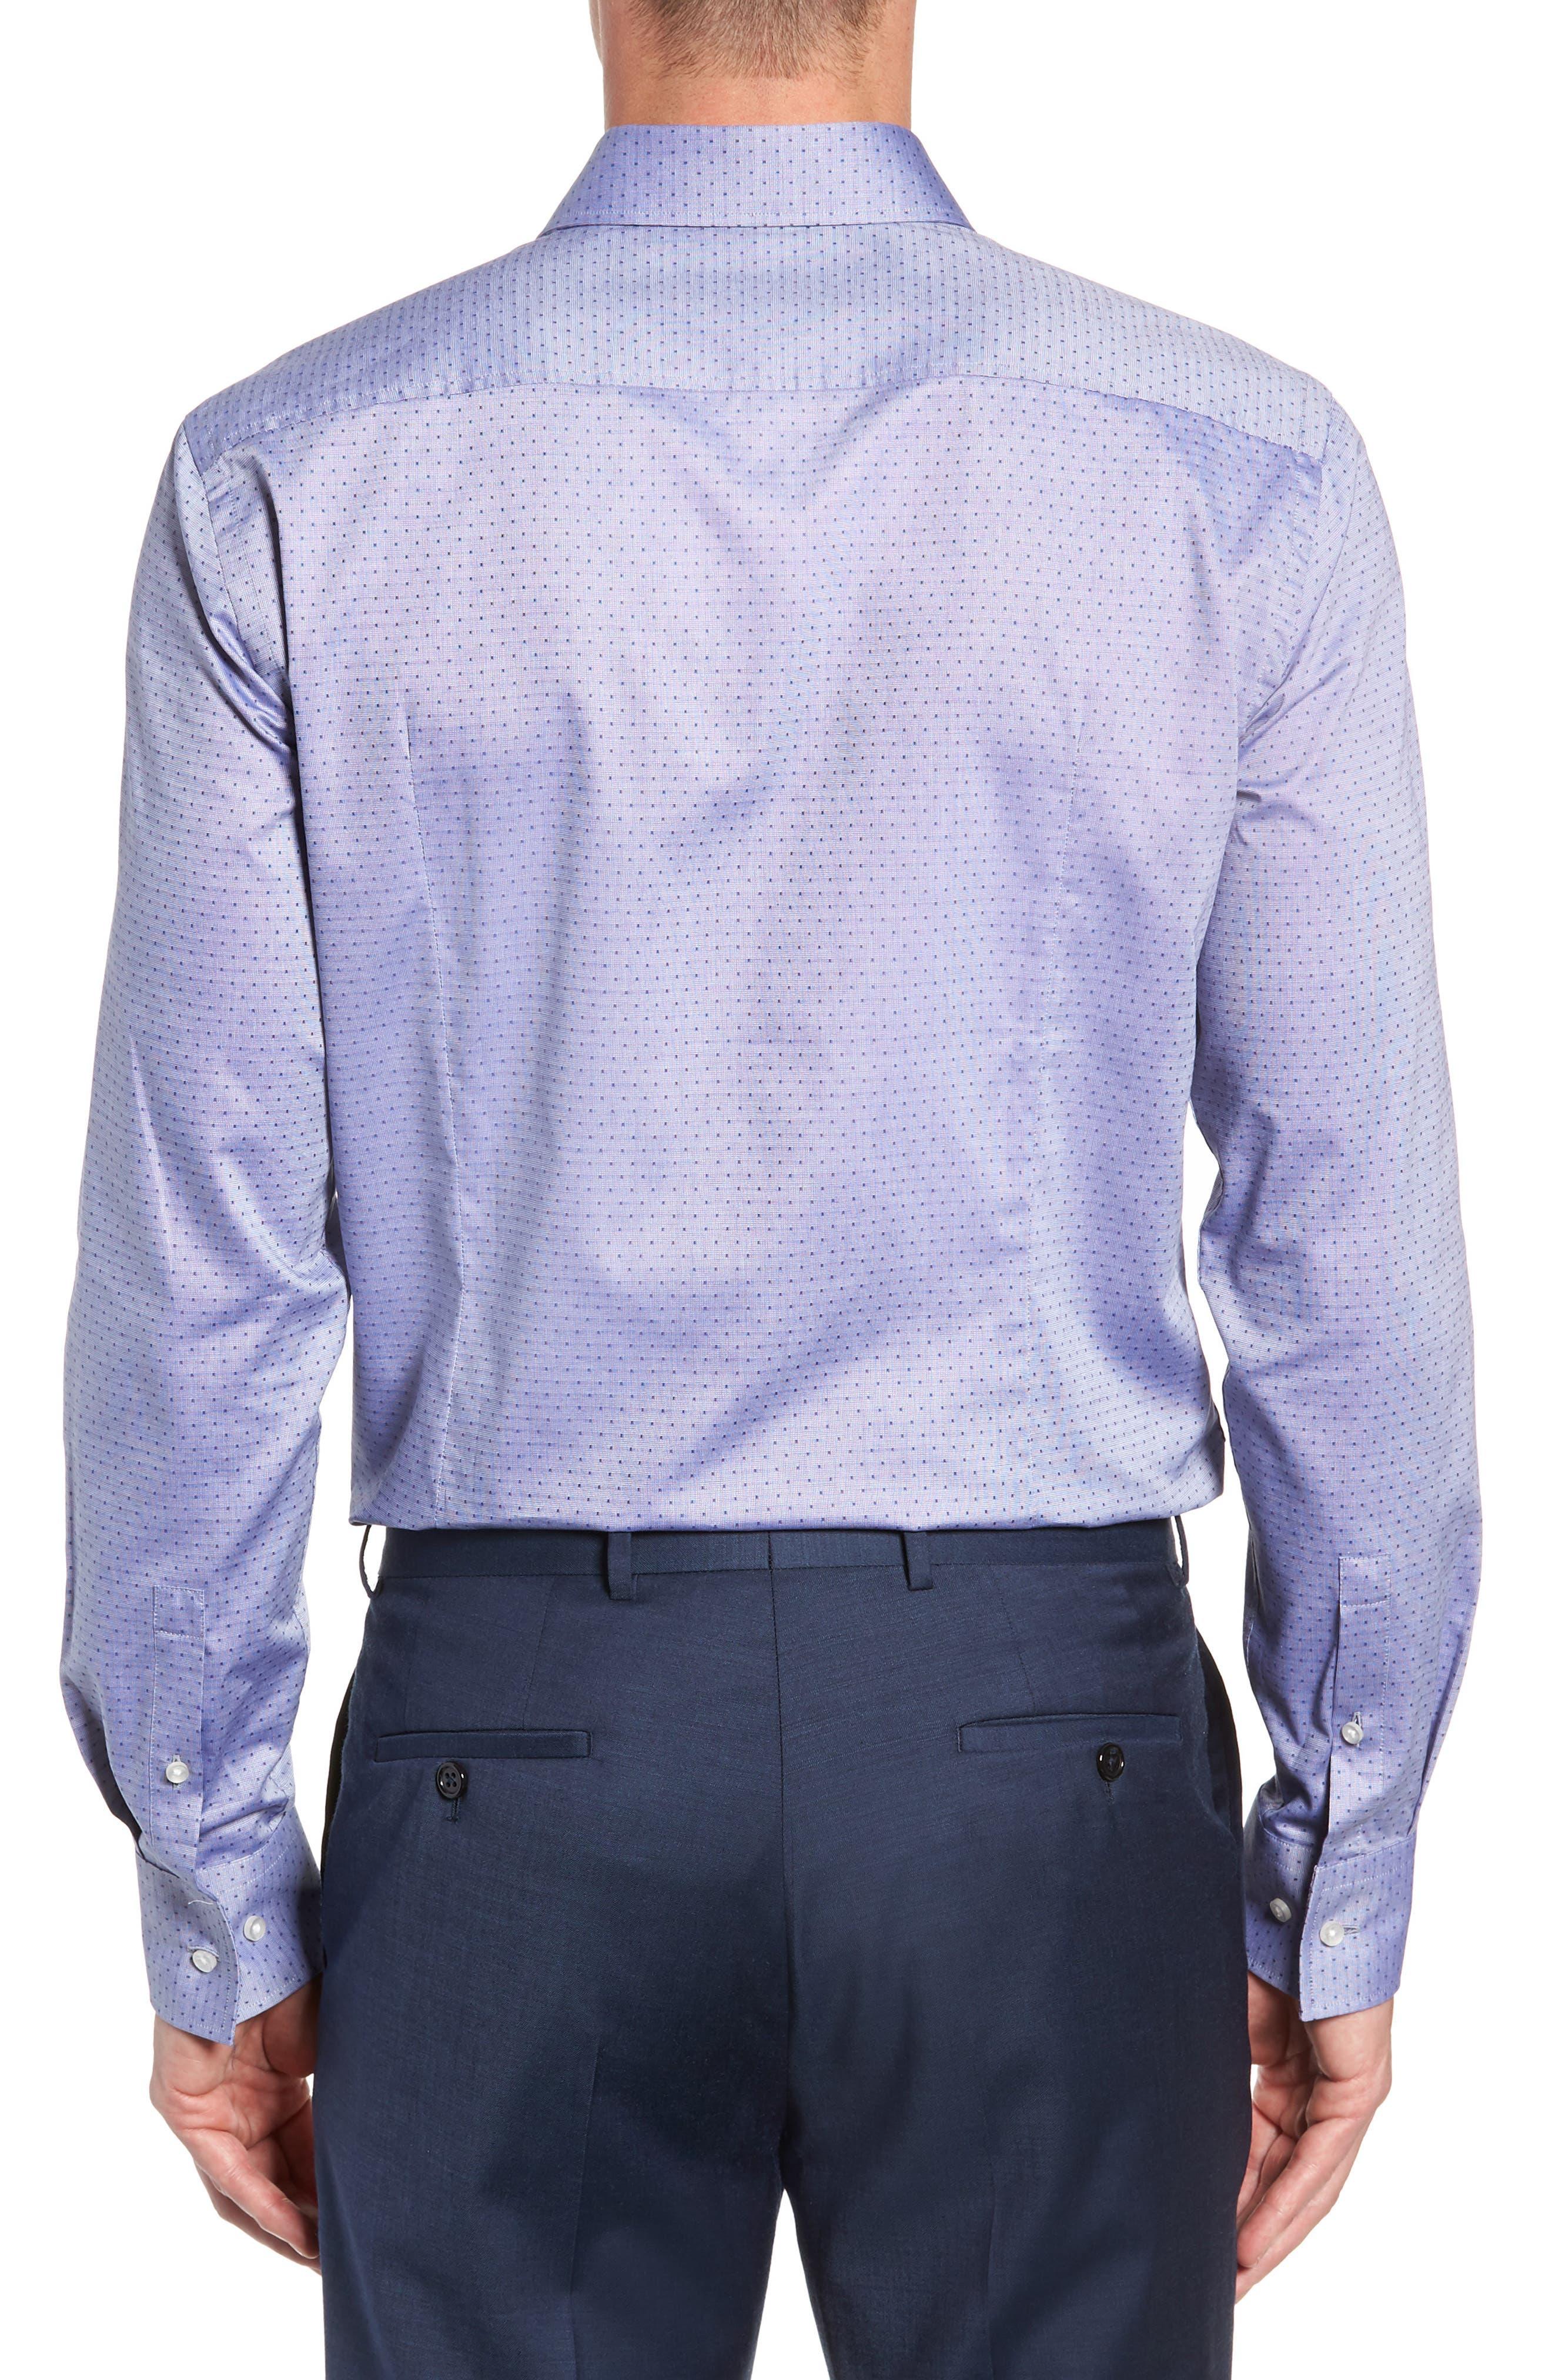 Jason Slim Fit Dot Dress Shirt,                             Alternate thumbnail 3, color,                             NAVY